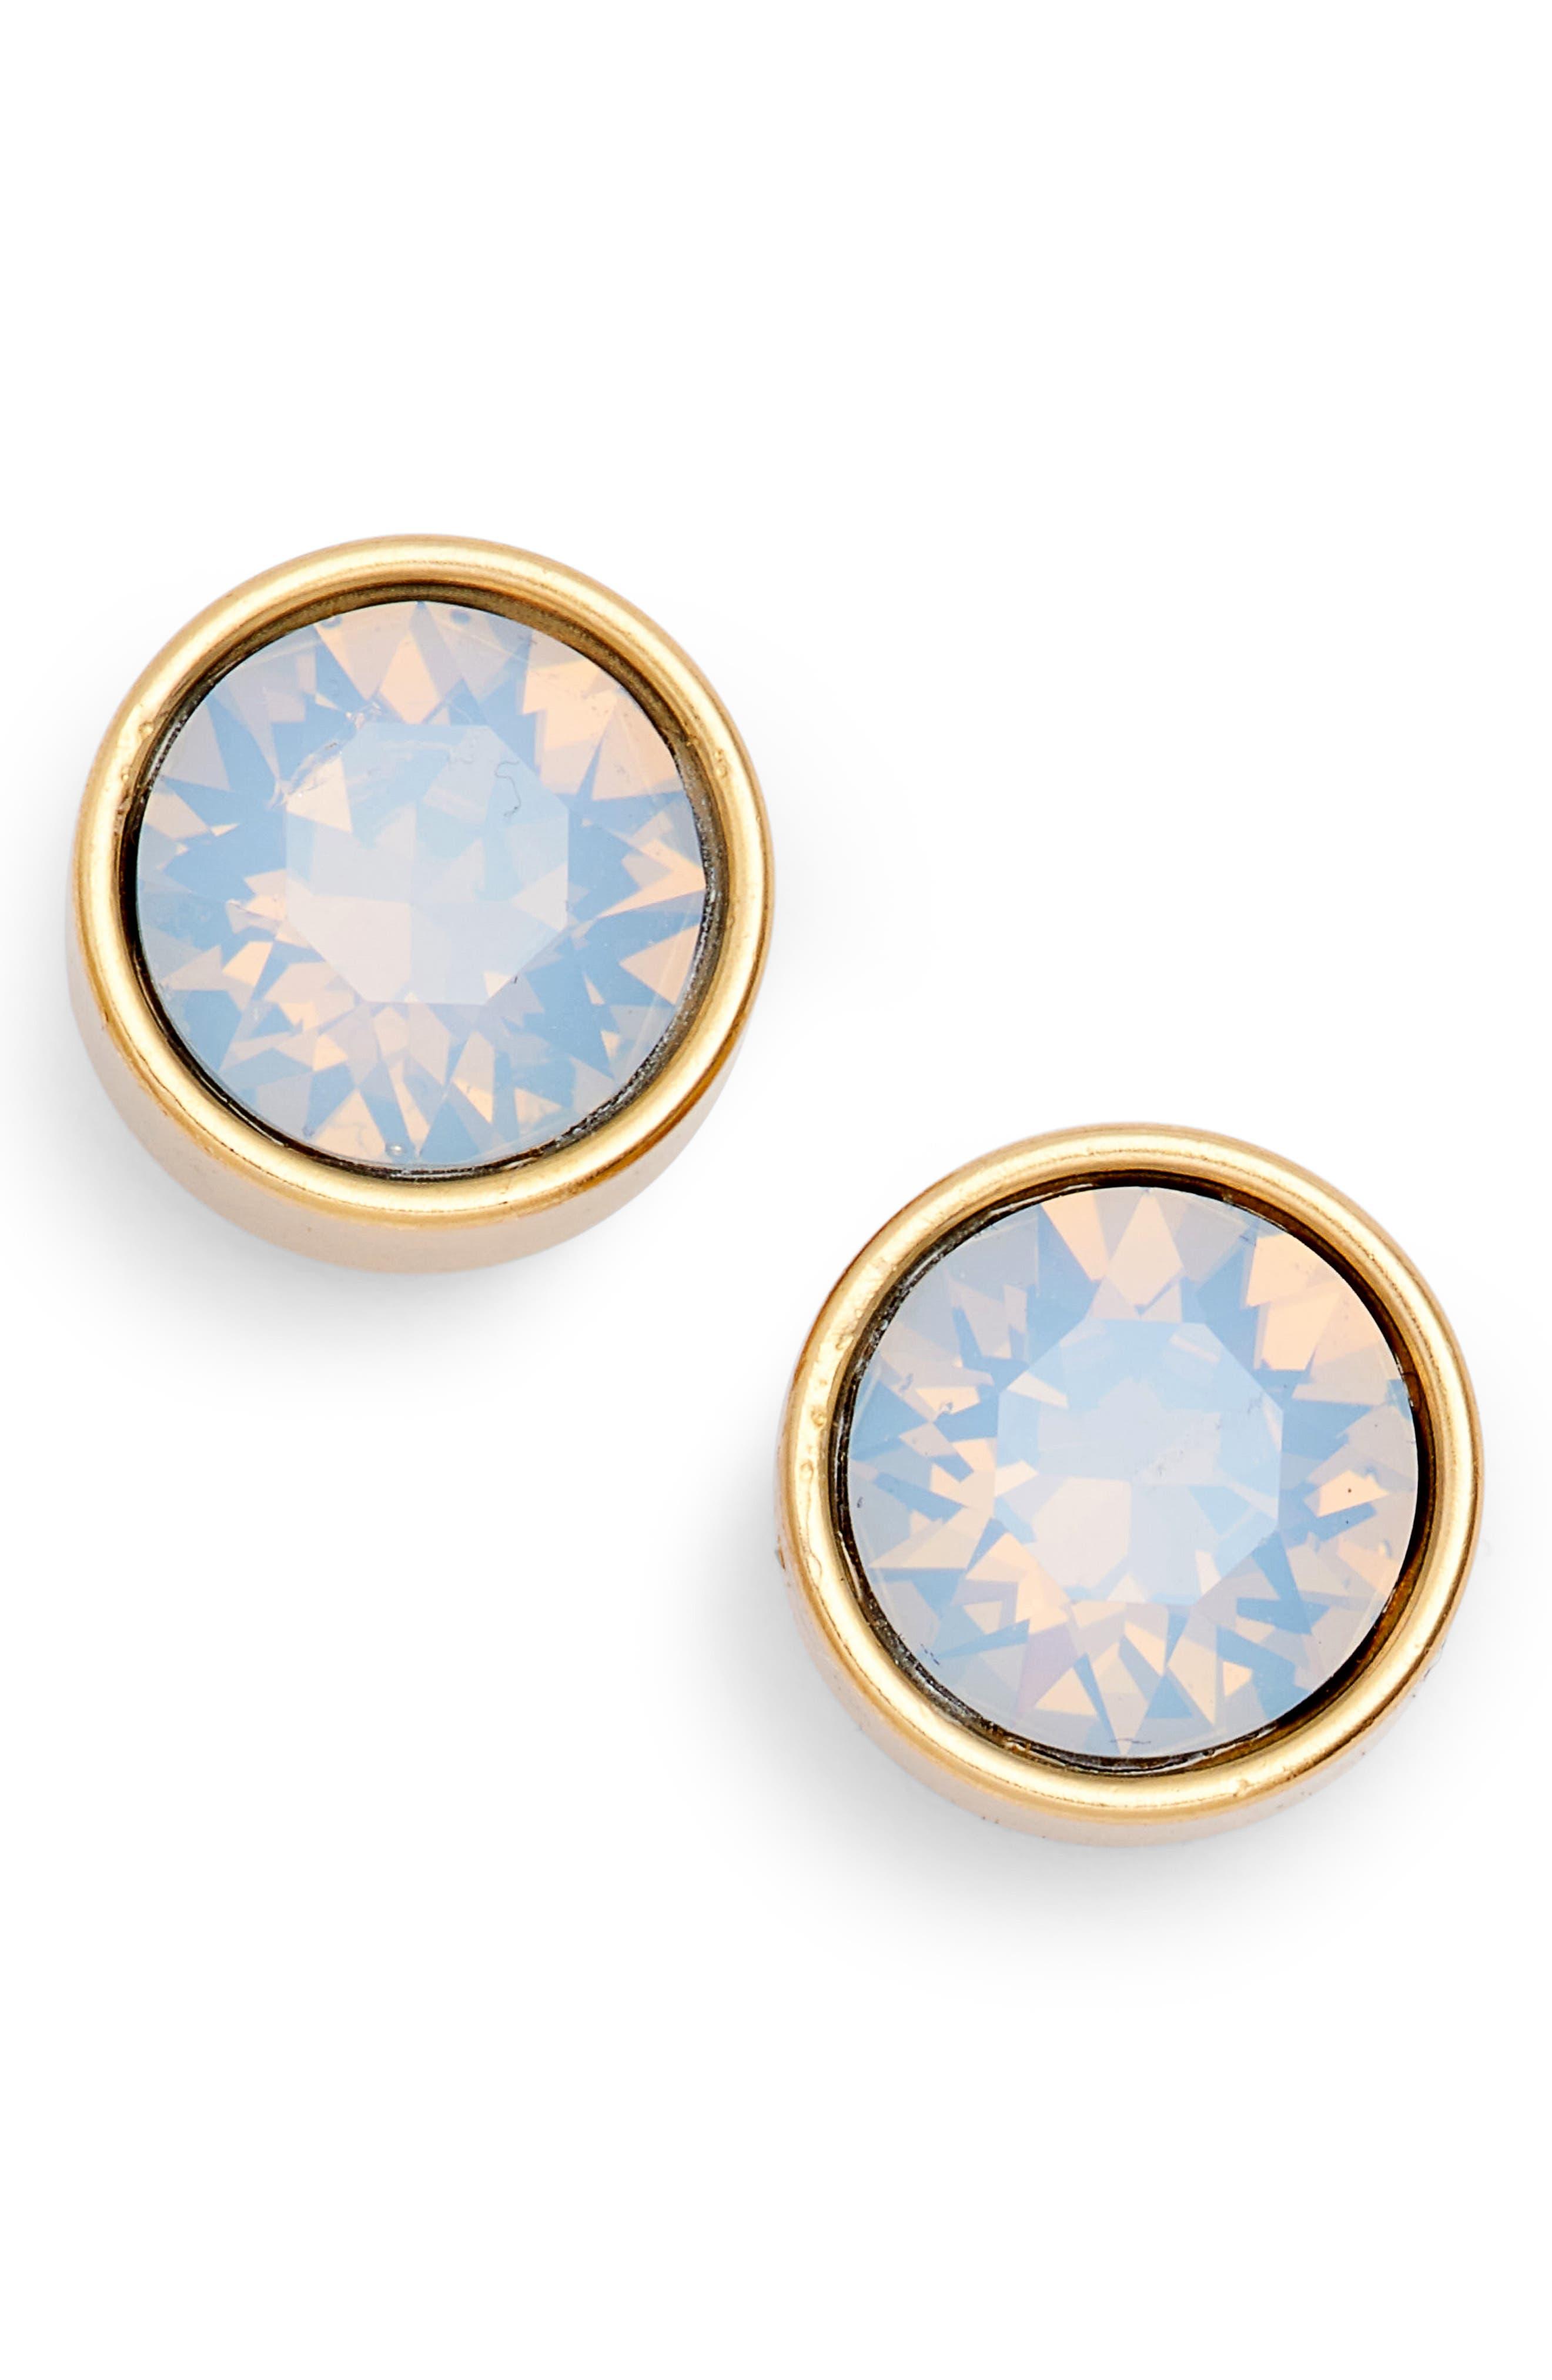 Bezel Set Stud Earrings,                             Main thumbnail 1, color,                             Cashmere/ Gold